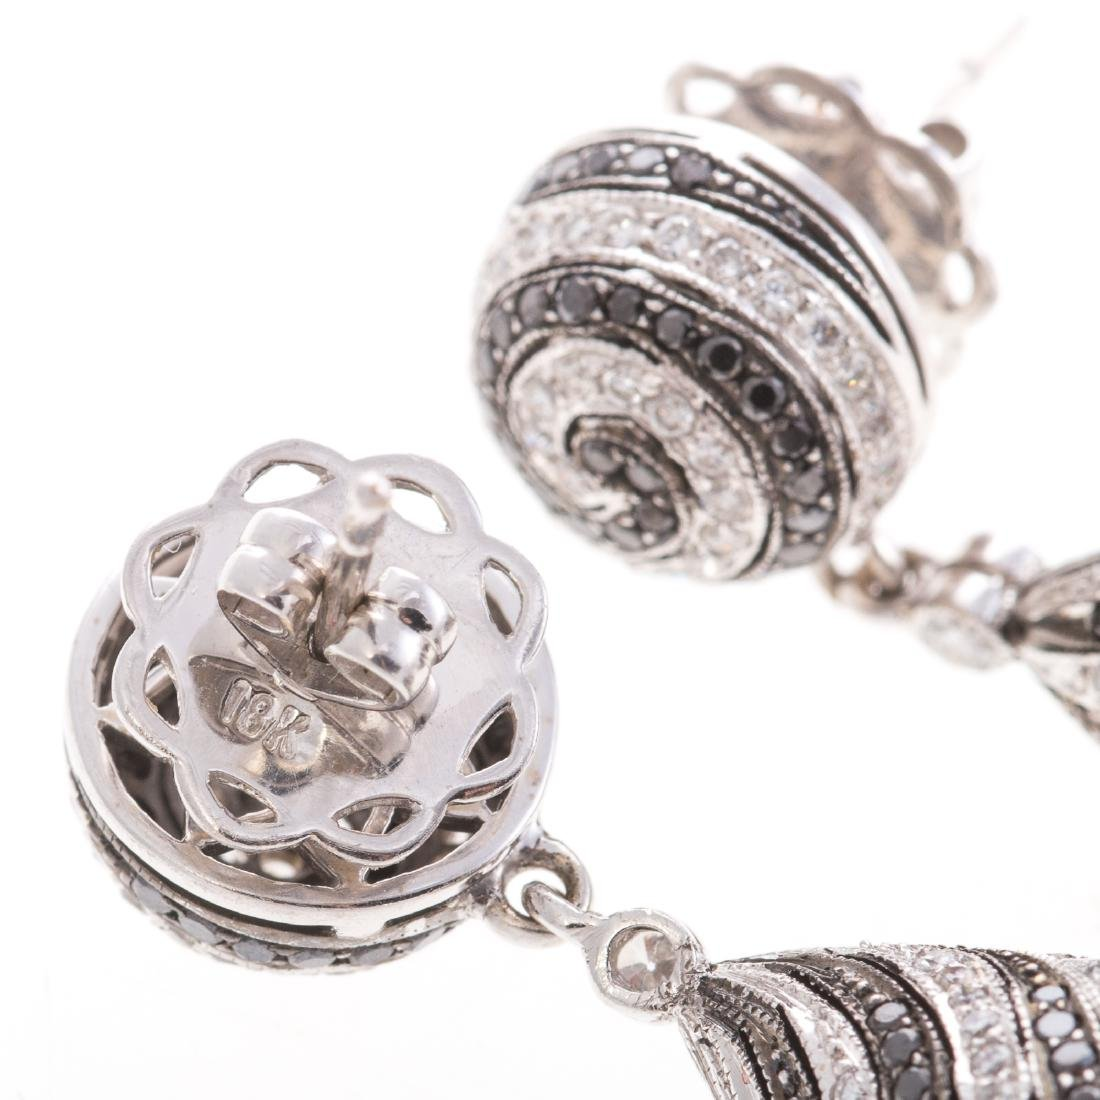 A Pair of Spiral Black & White Diamond Earrings - 3